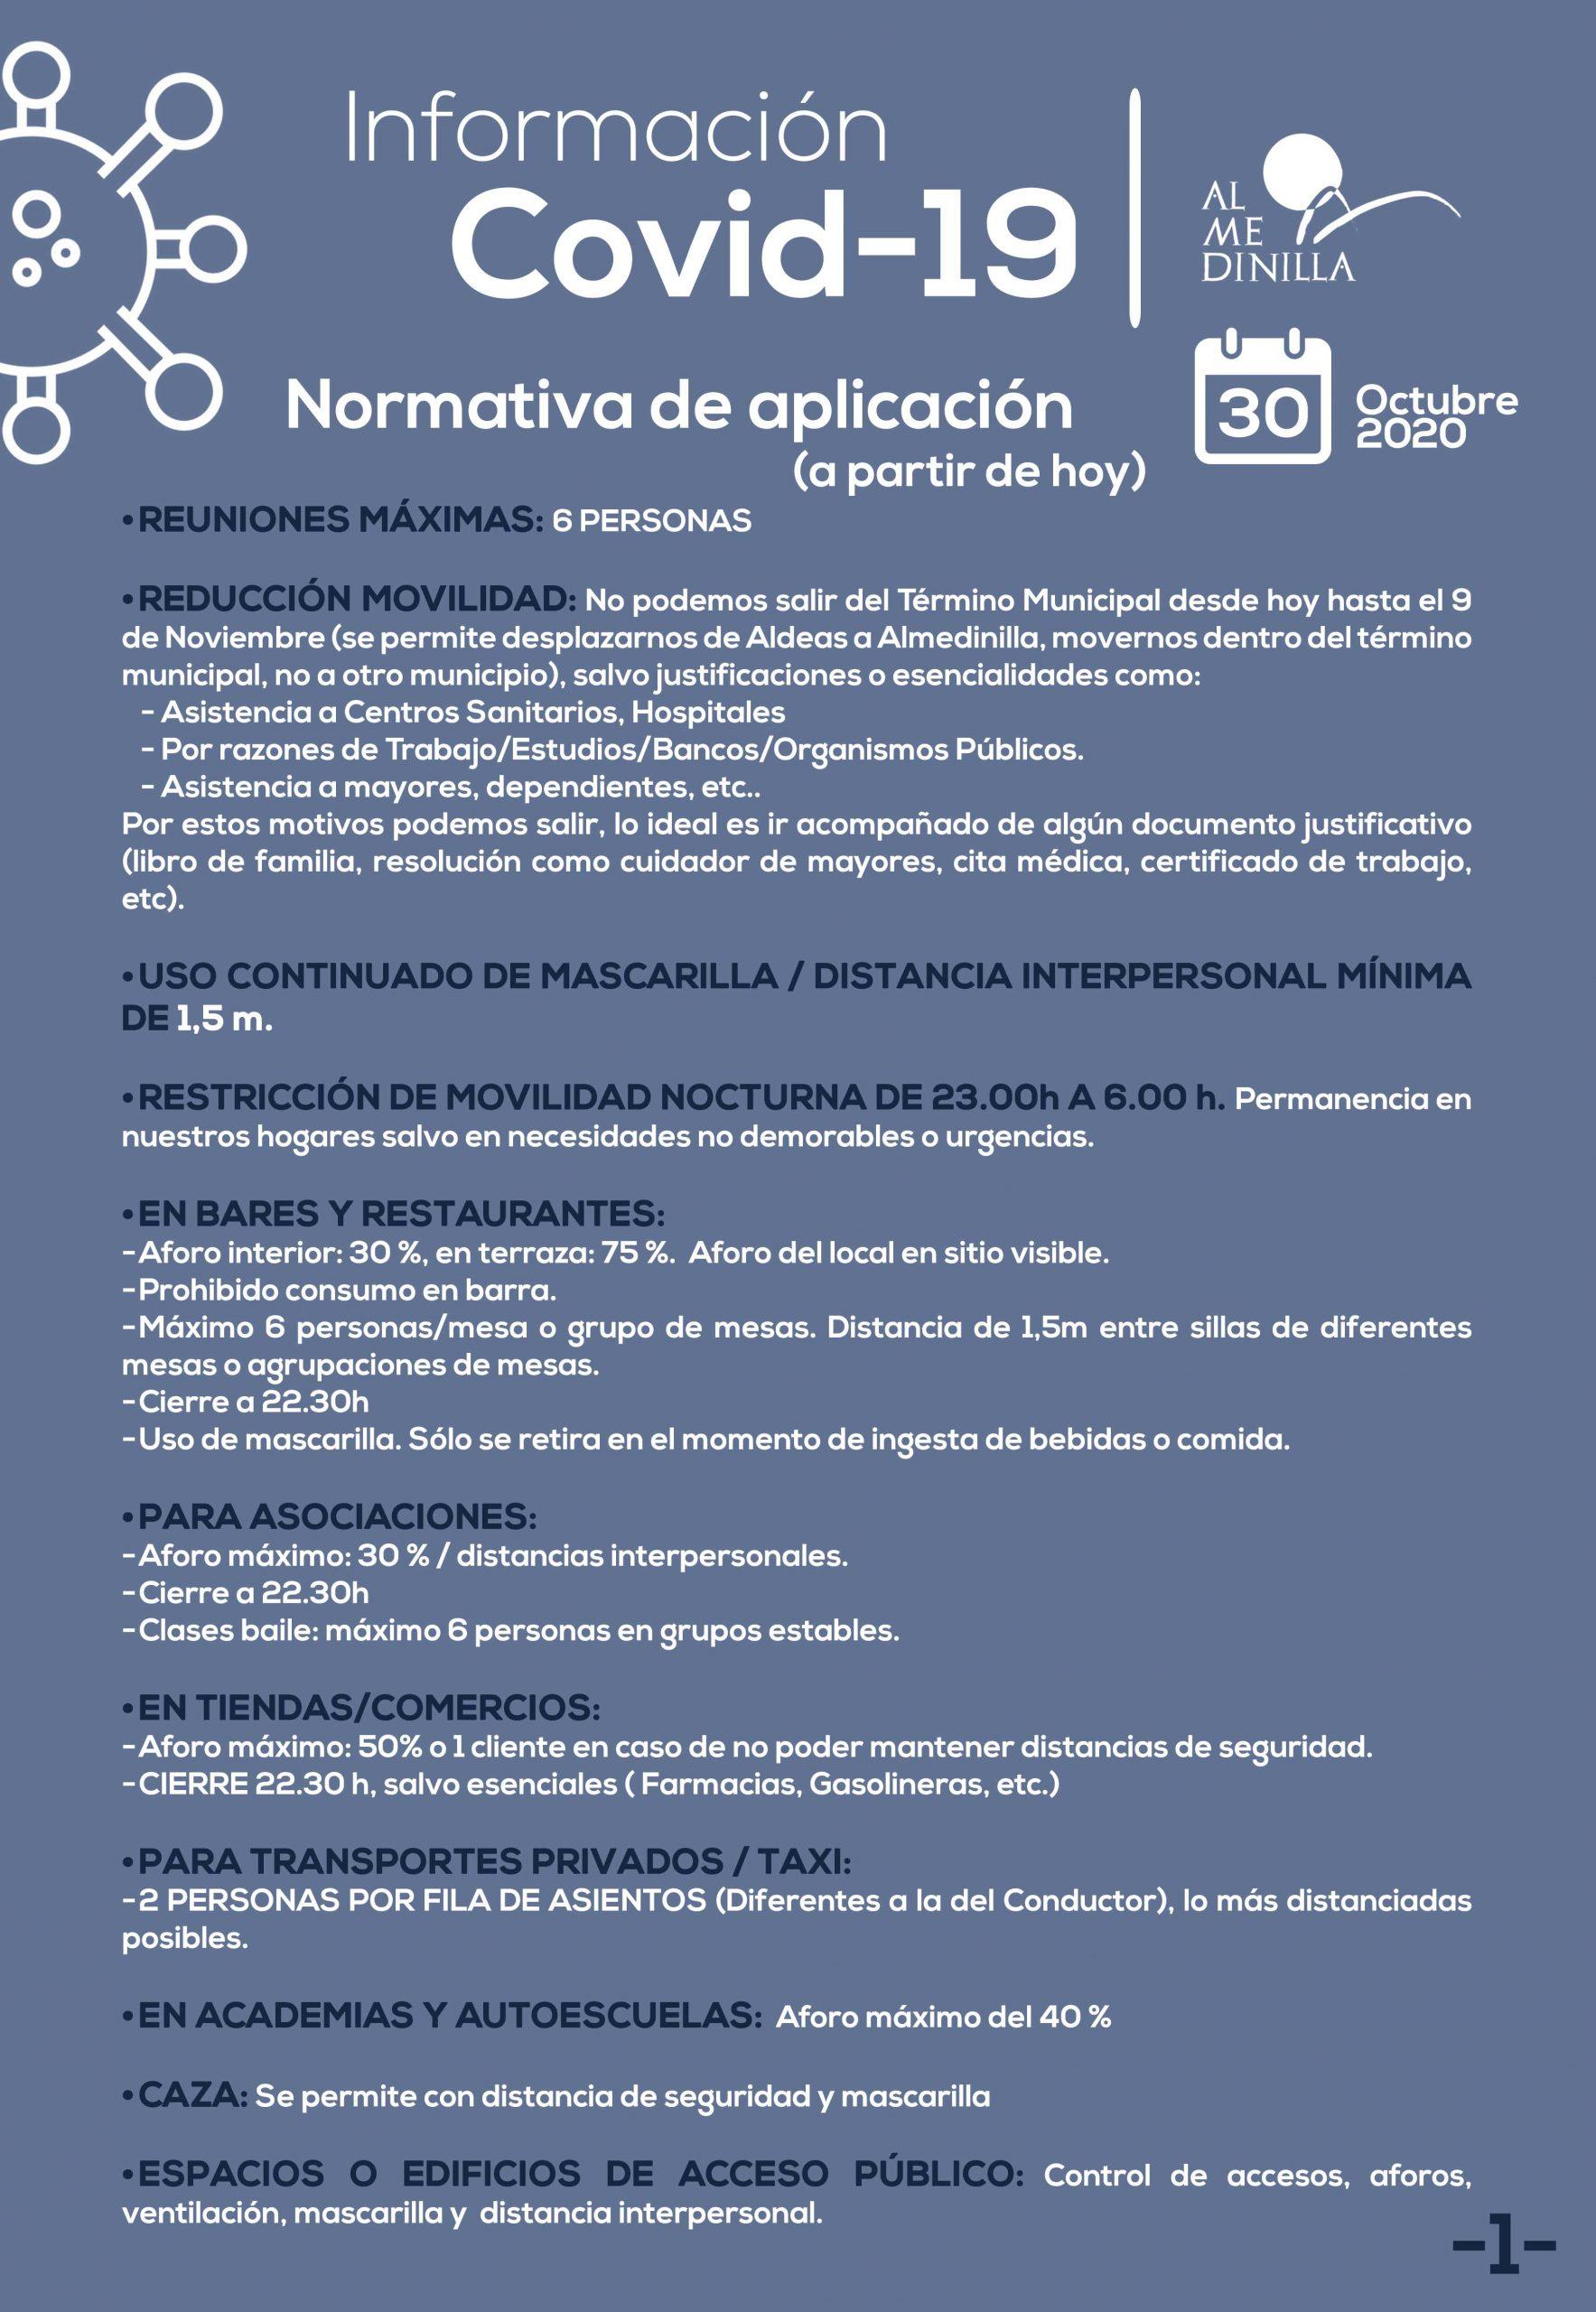 Comunicado Covid-19 a 30 de octubre 2020 1